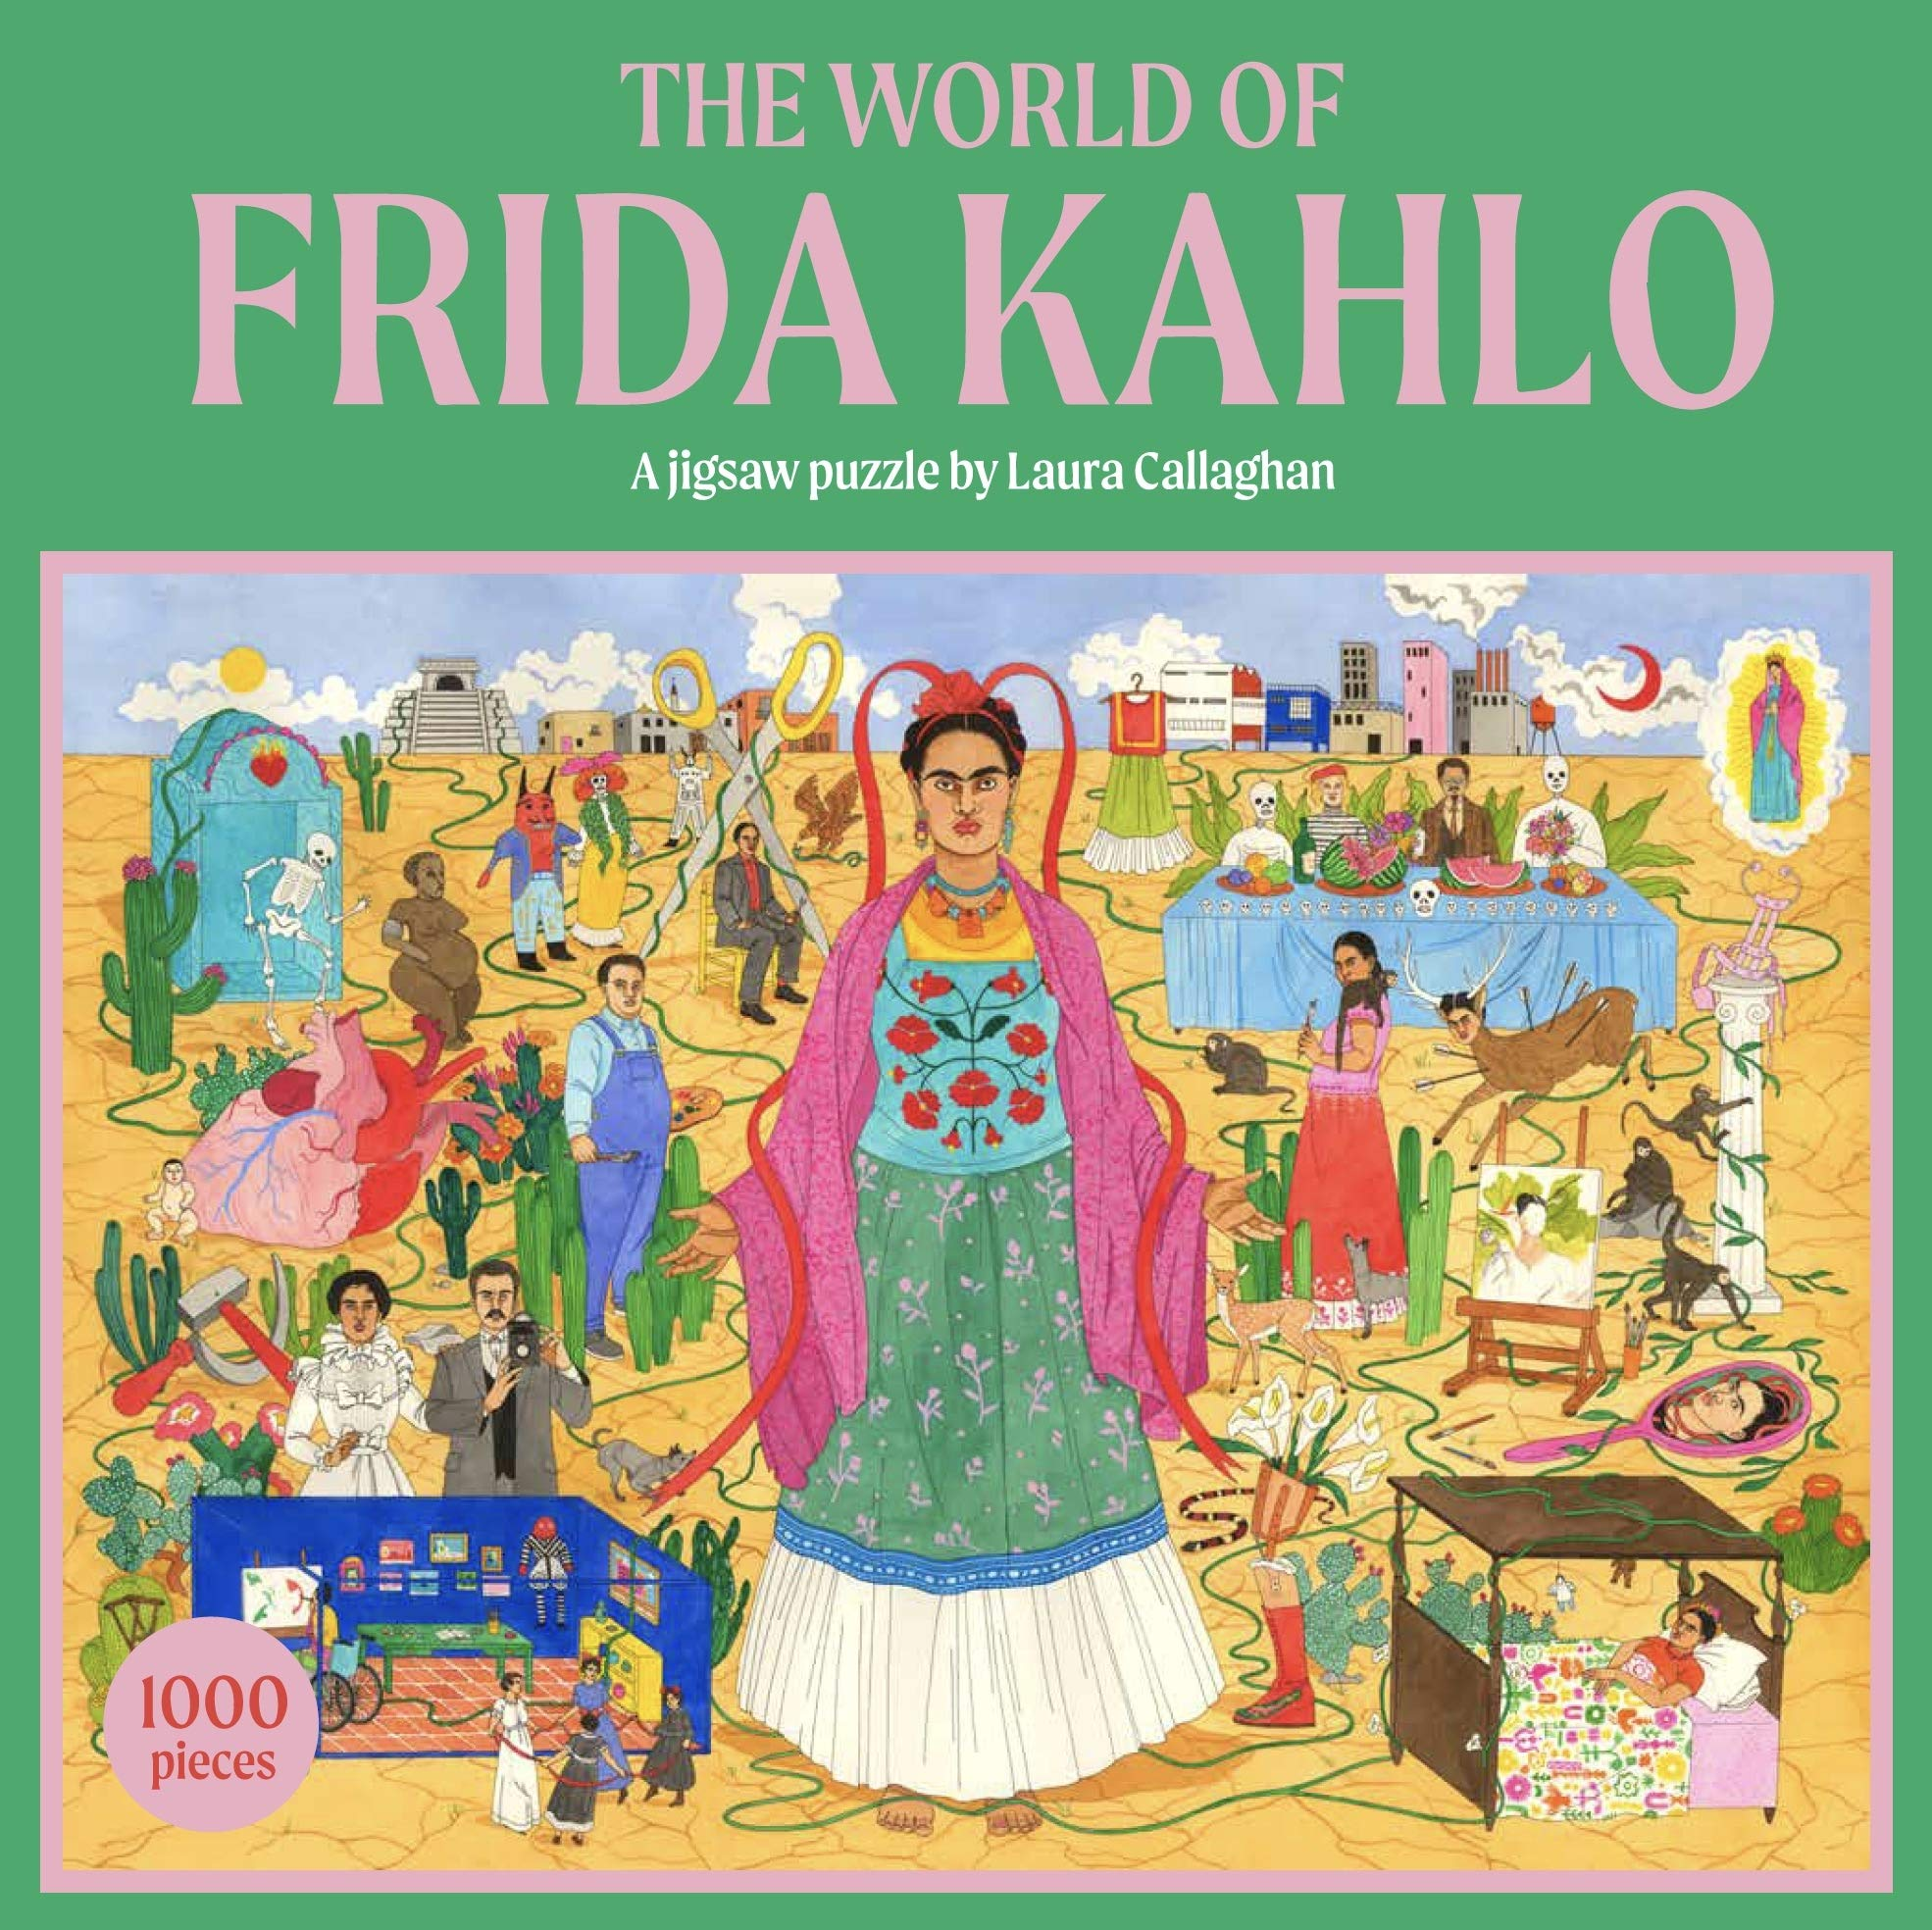 The World of Frida Kahlo Famous People Jigsaw Puzzle